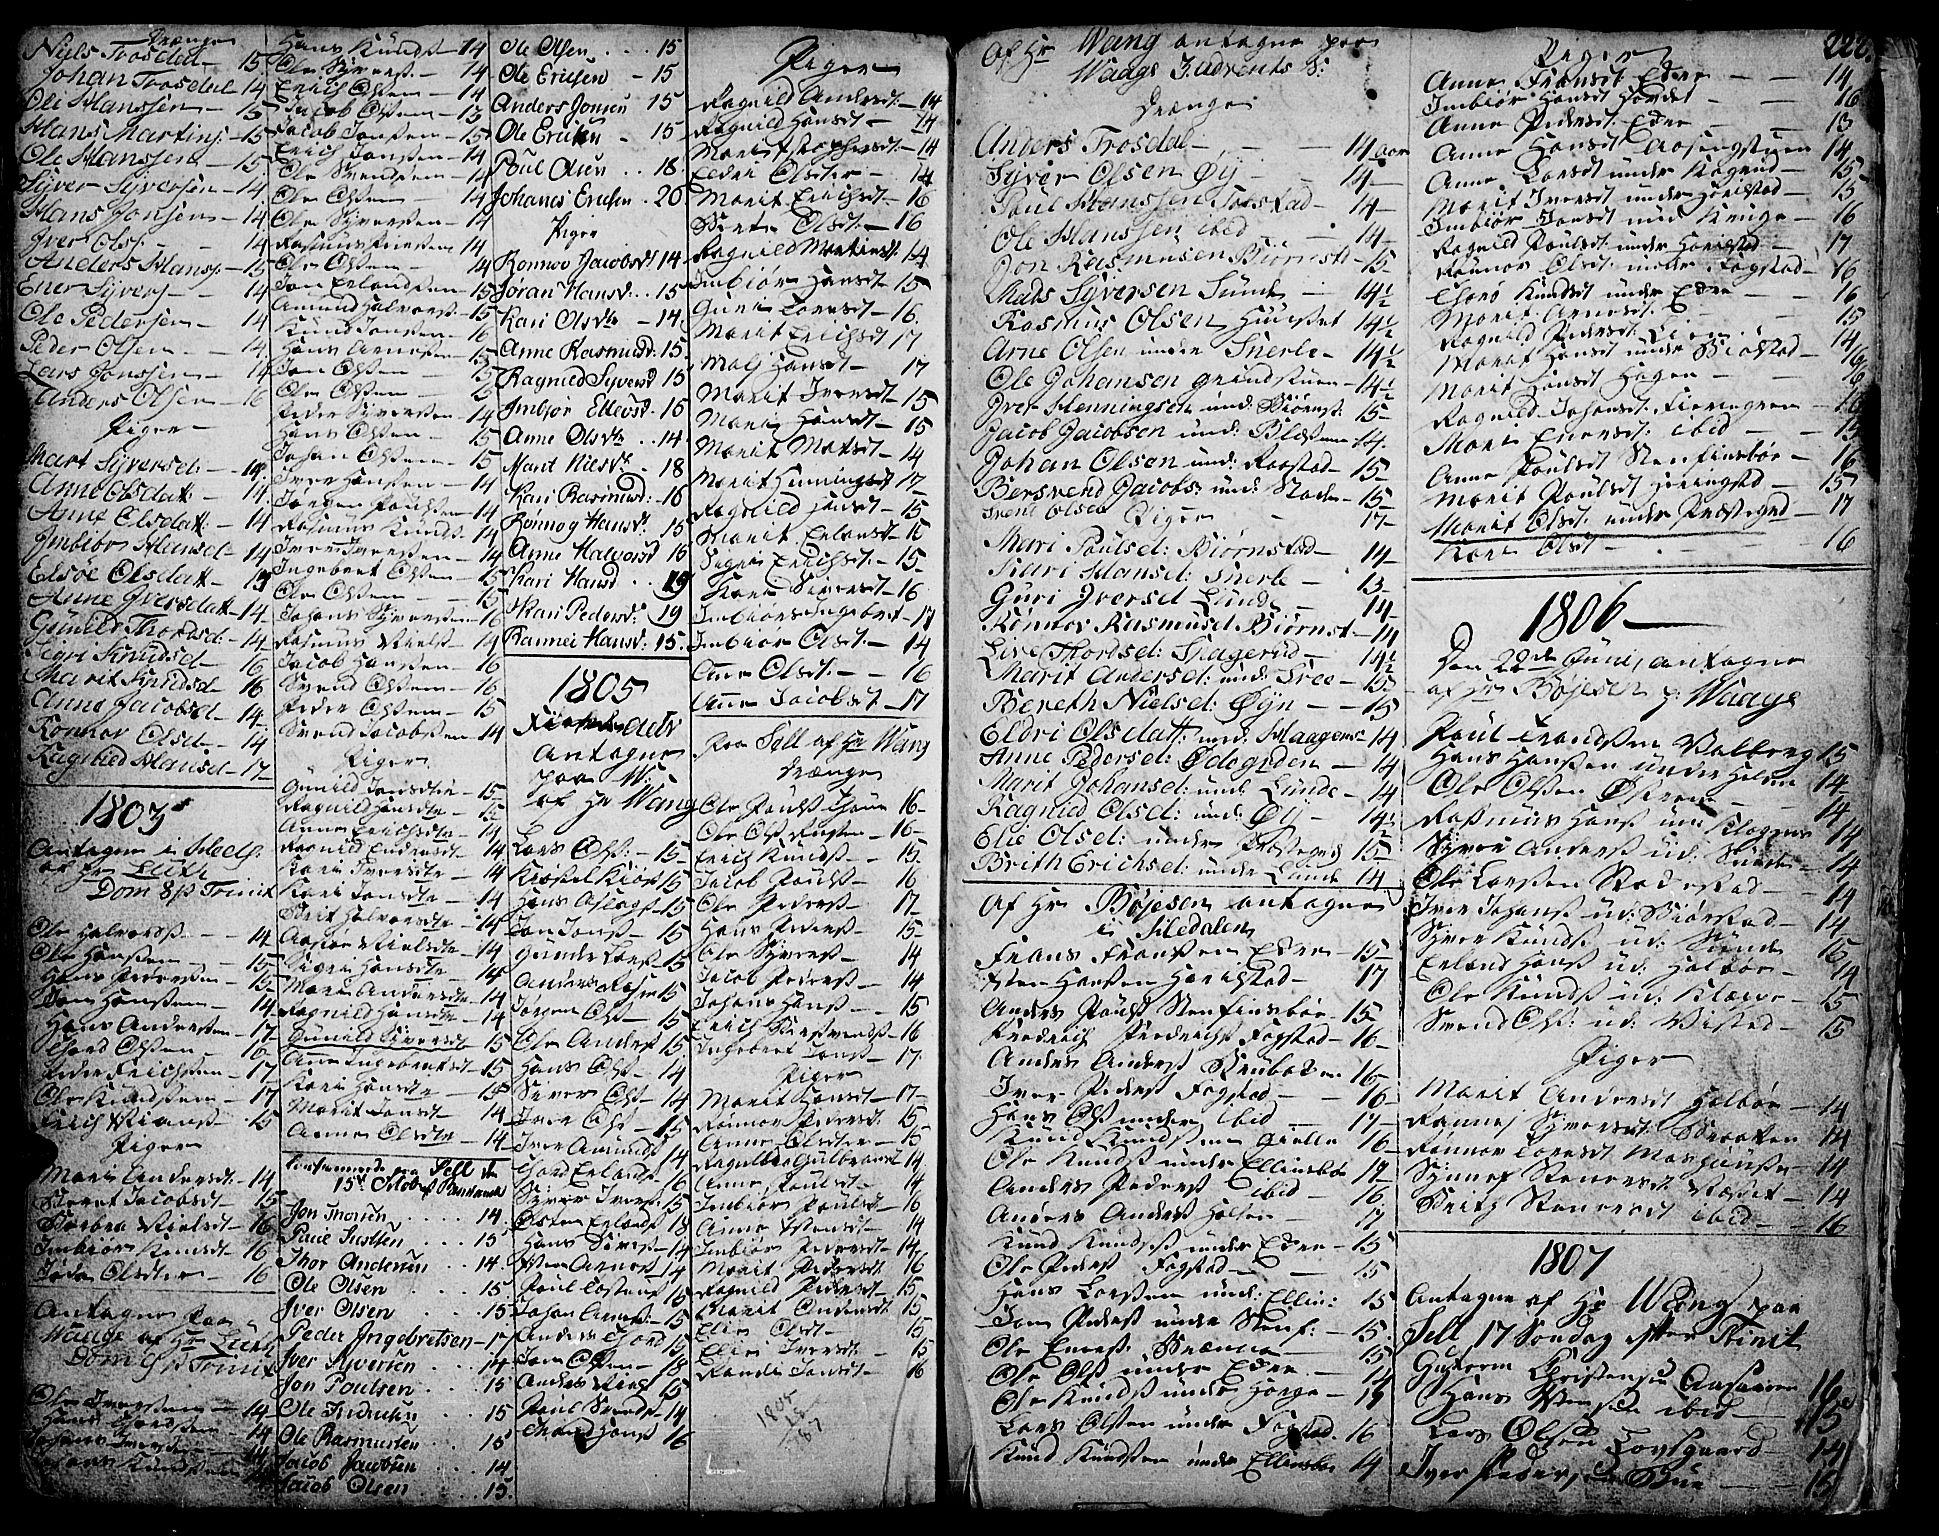 SAH, Vågå prestekontor, Ministerialbok nr. 1, 1739-1810, s. 222